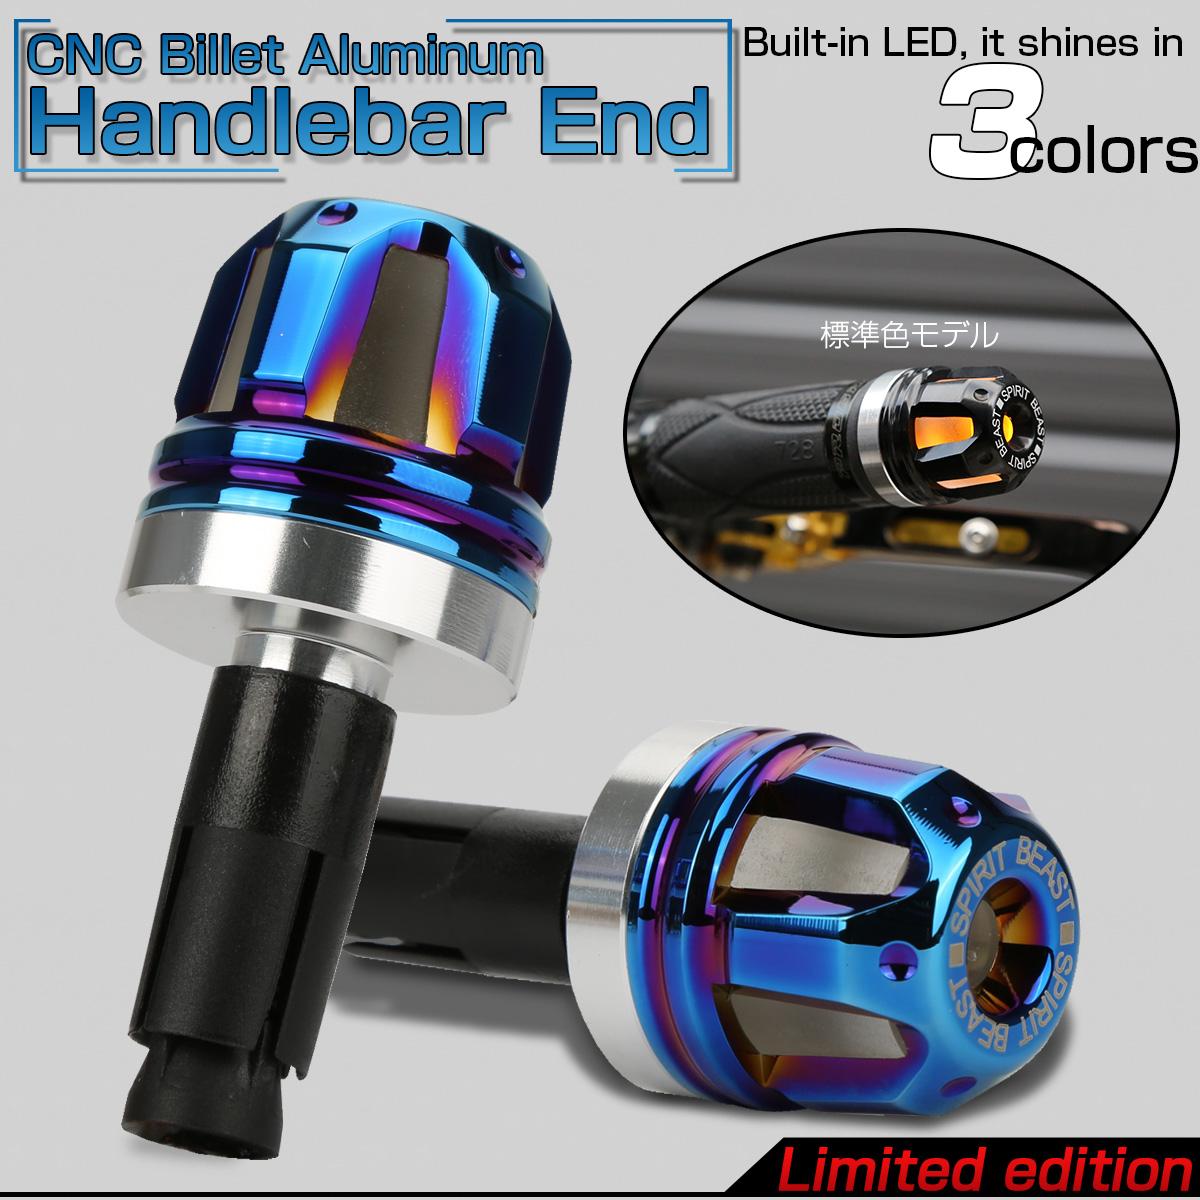 LED内蔵 CNC アルミビレット バーエンド キャップ ハンドル 焼チタン&シルバー グリップエンド 内径13-20mm 3色発光 F-501-ST